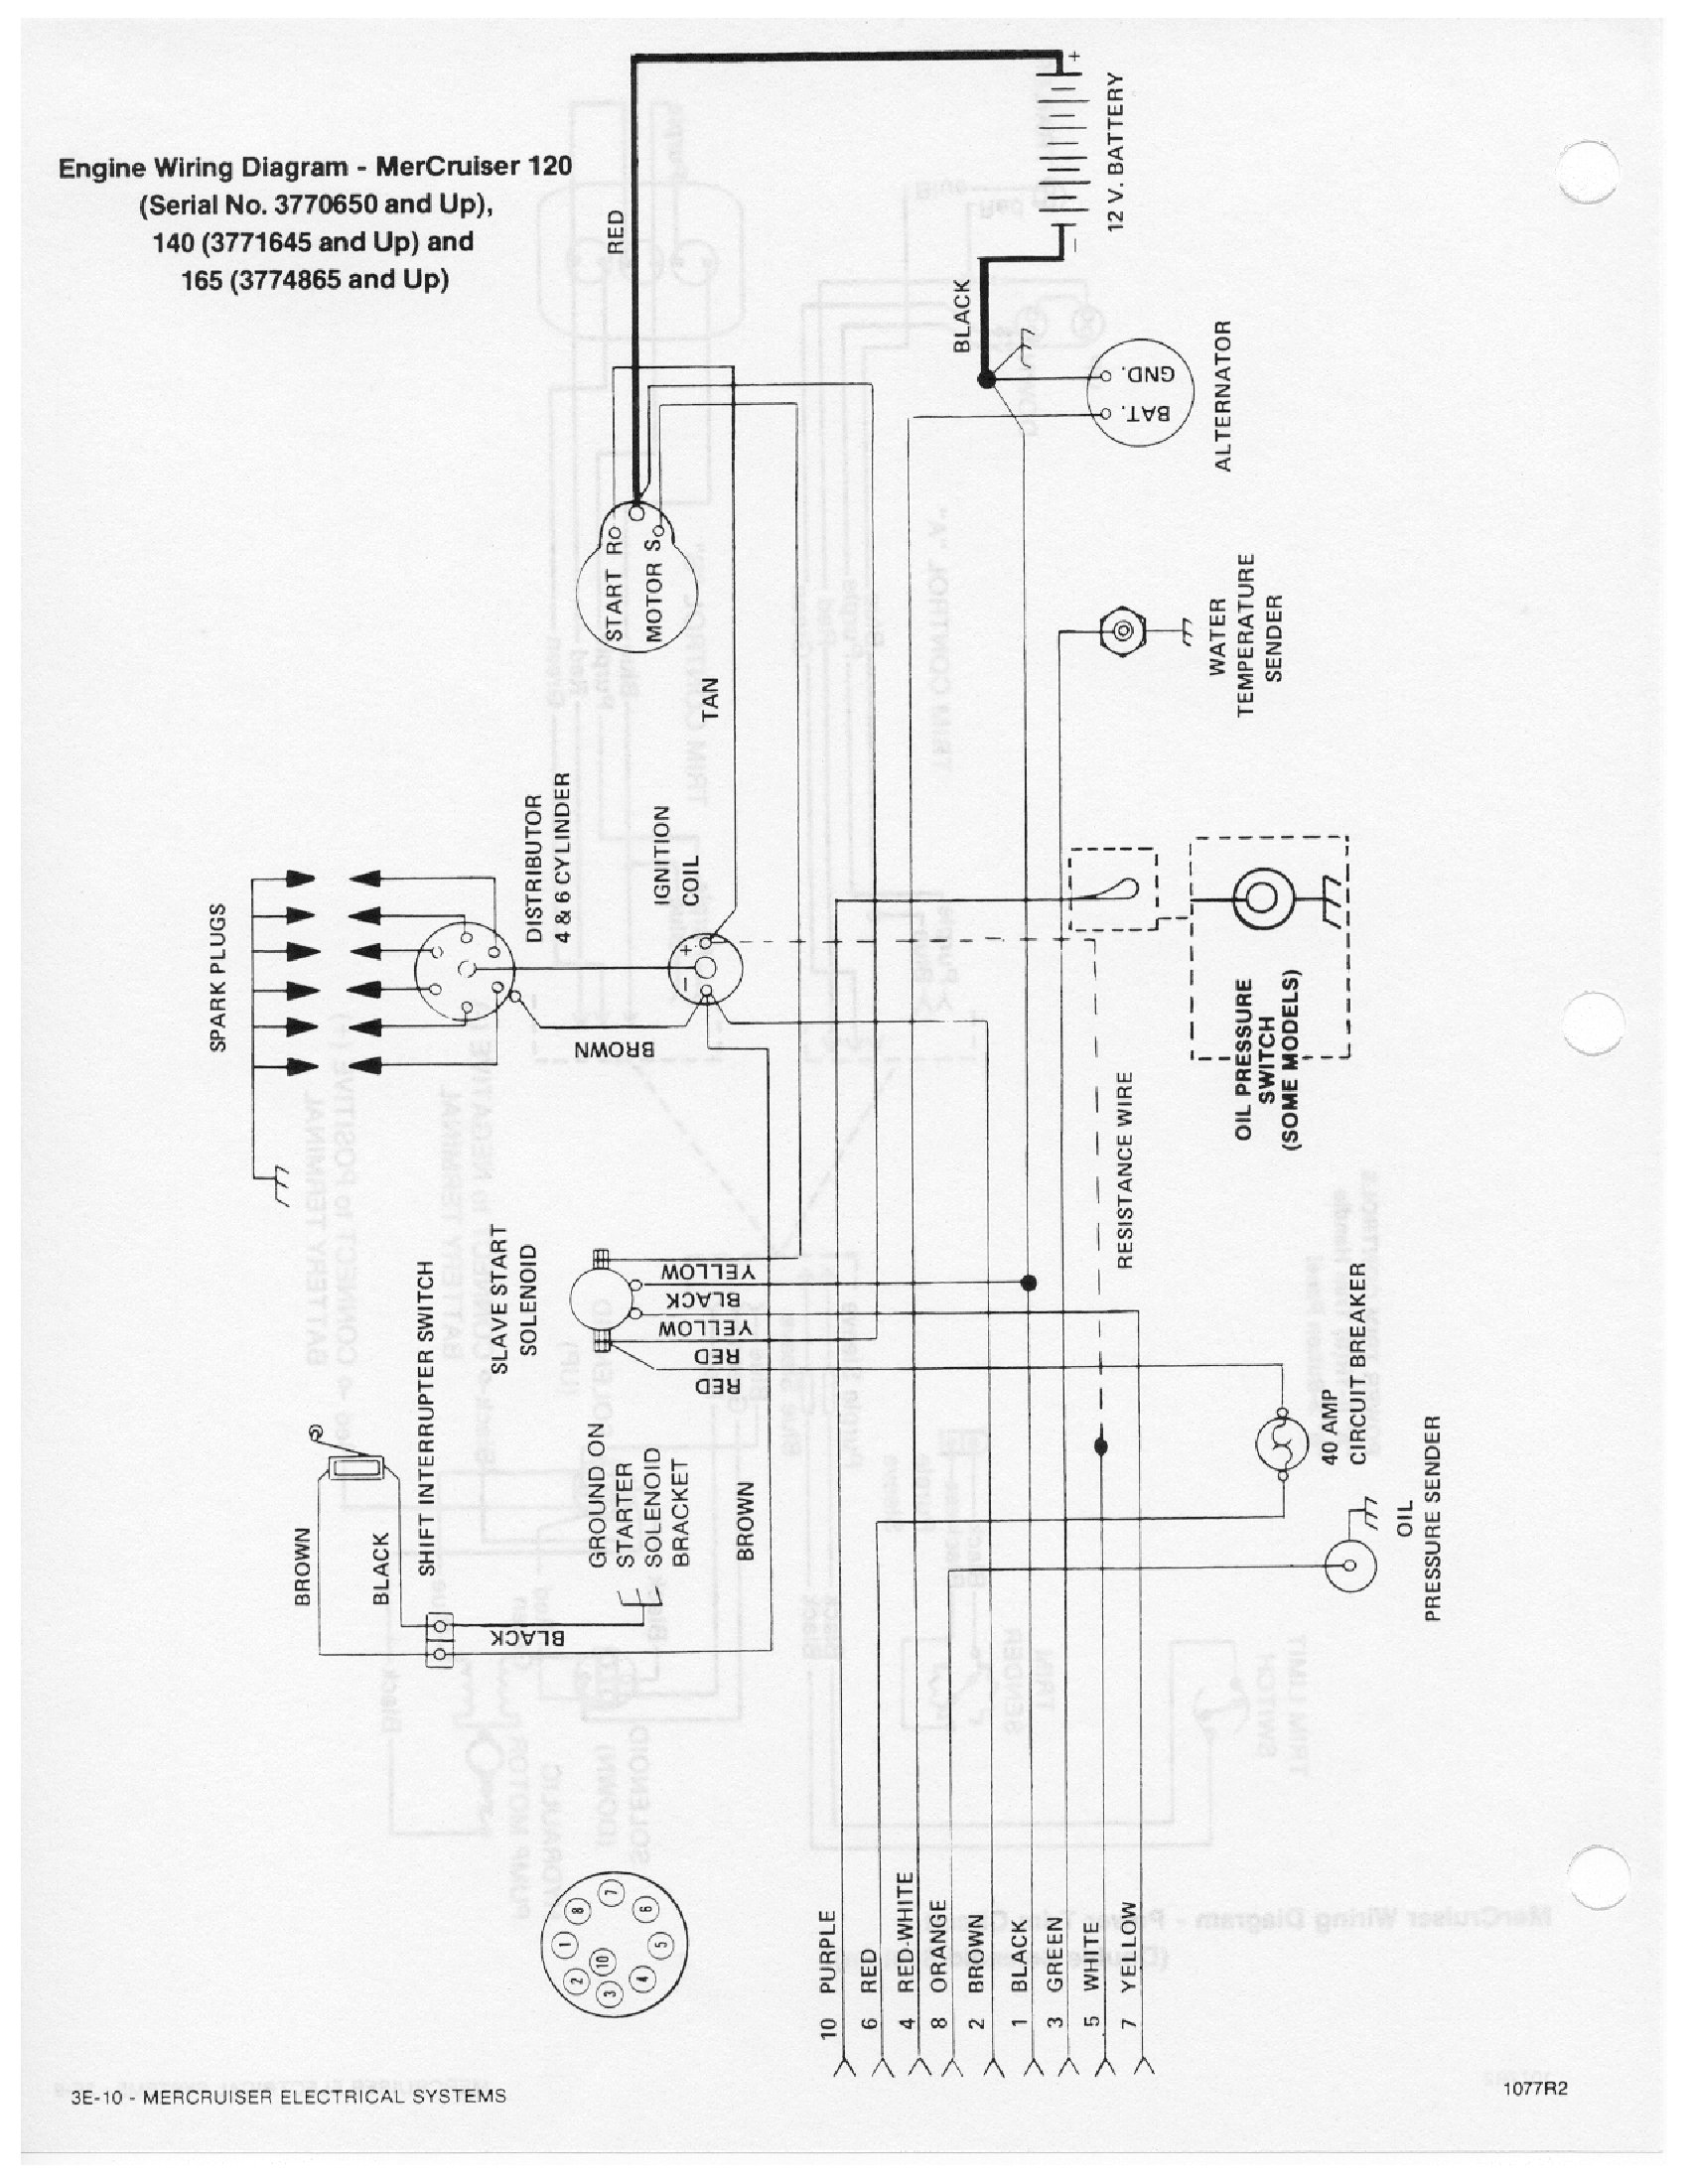 7uyfp Pontiac Bonneville Pontiac Bonneville 1995 Braking System additionally Gm Abs Control Unit 19244887 moreover Chrysler Parts Diagram Smart Wiring Diagrams furthermore 2008 Cadillac Escalade Headlight Wiring Diagram as well Pontiac Sunfire Blower Motor Location. on body control module on a 2000 pontiac sunfire